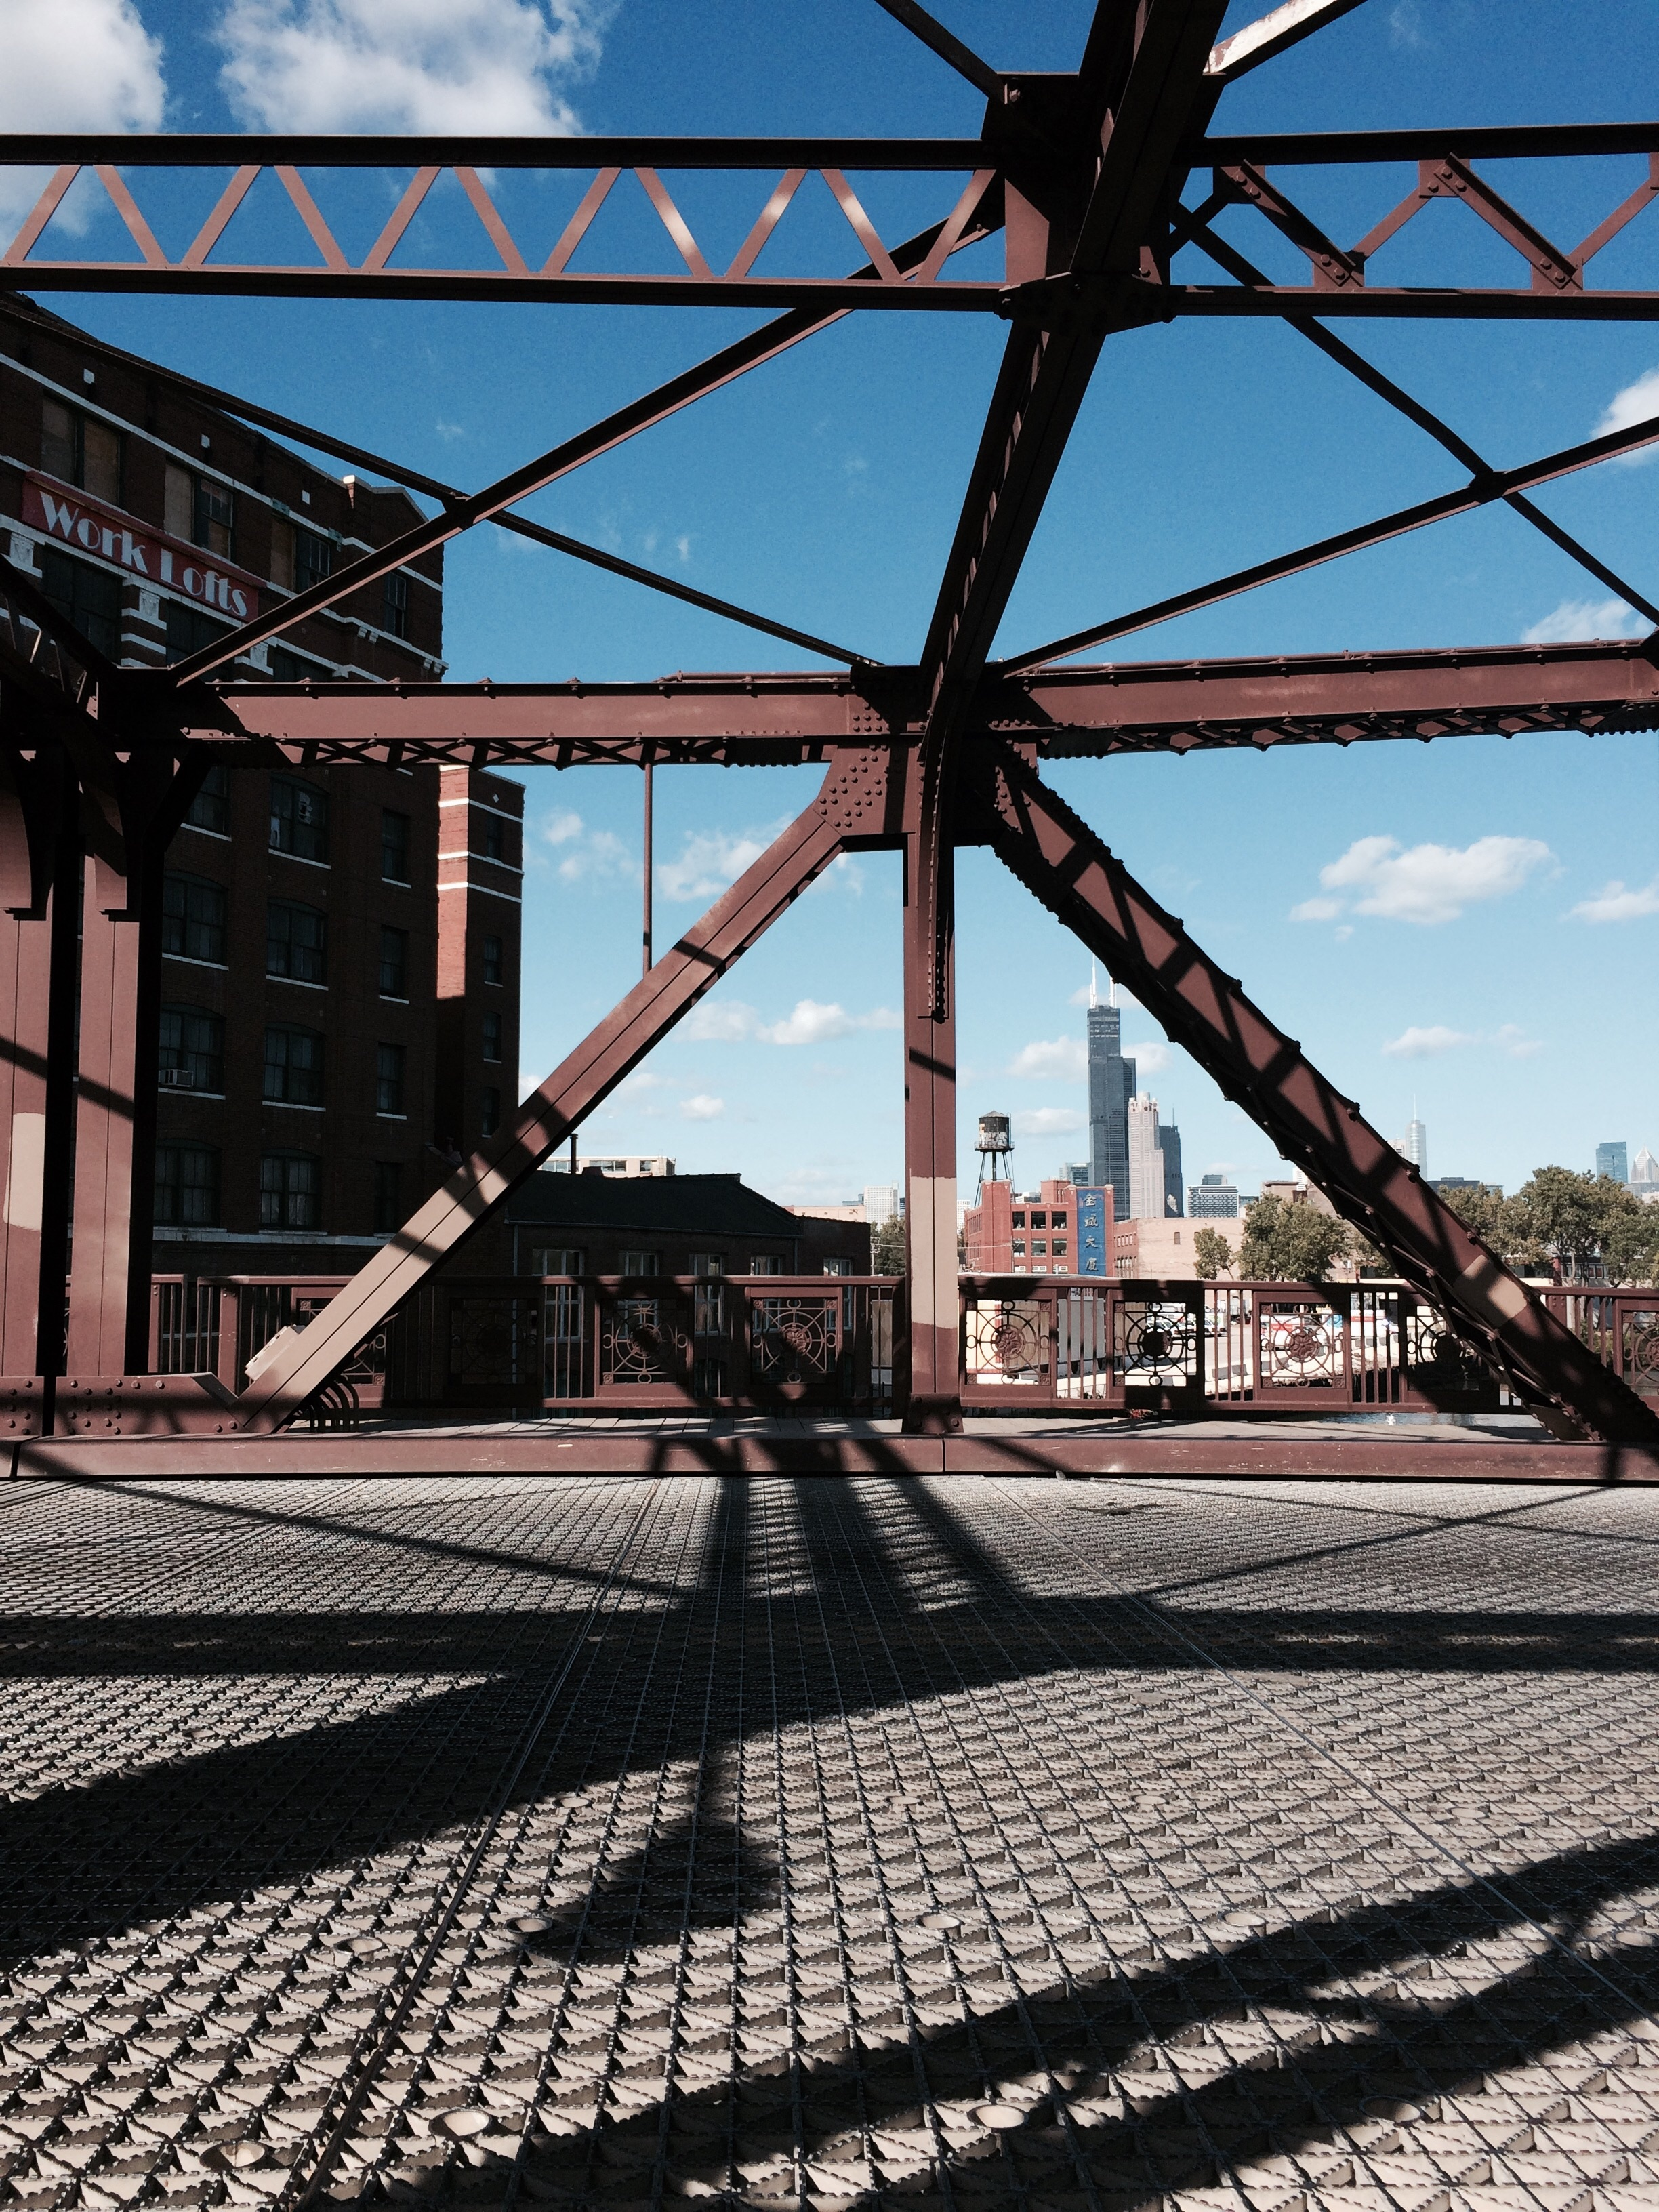 Cermak bridge, Chinatown.